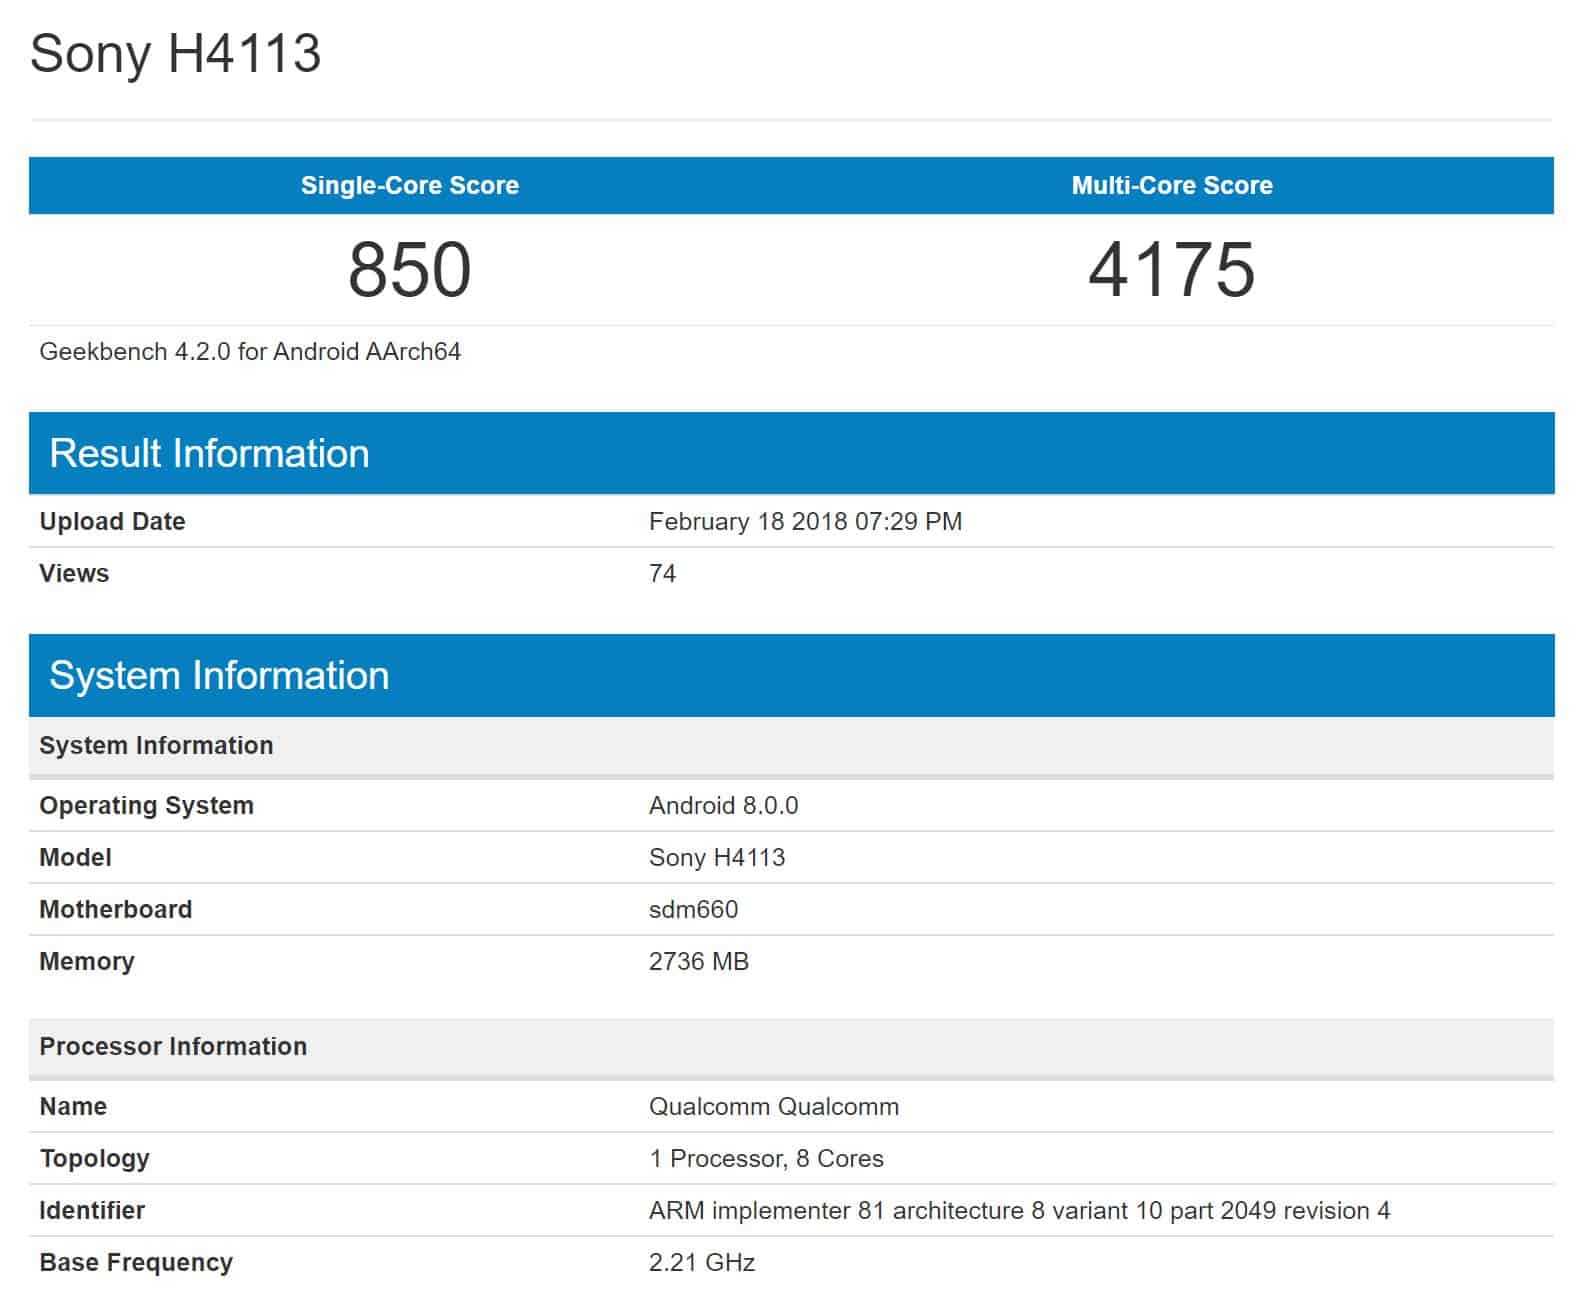 Sony H4113 Geekbench